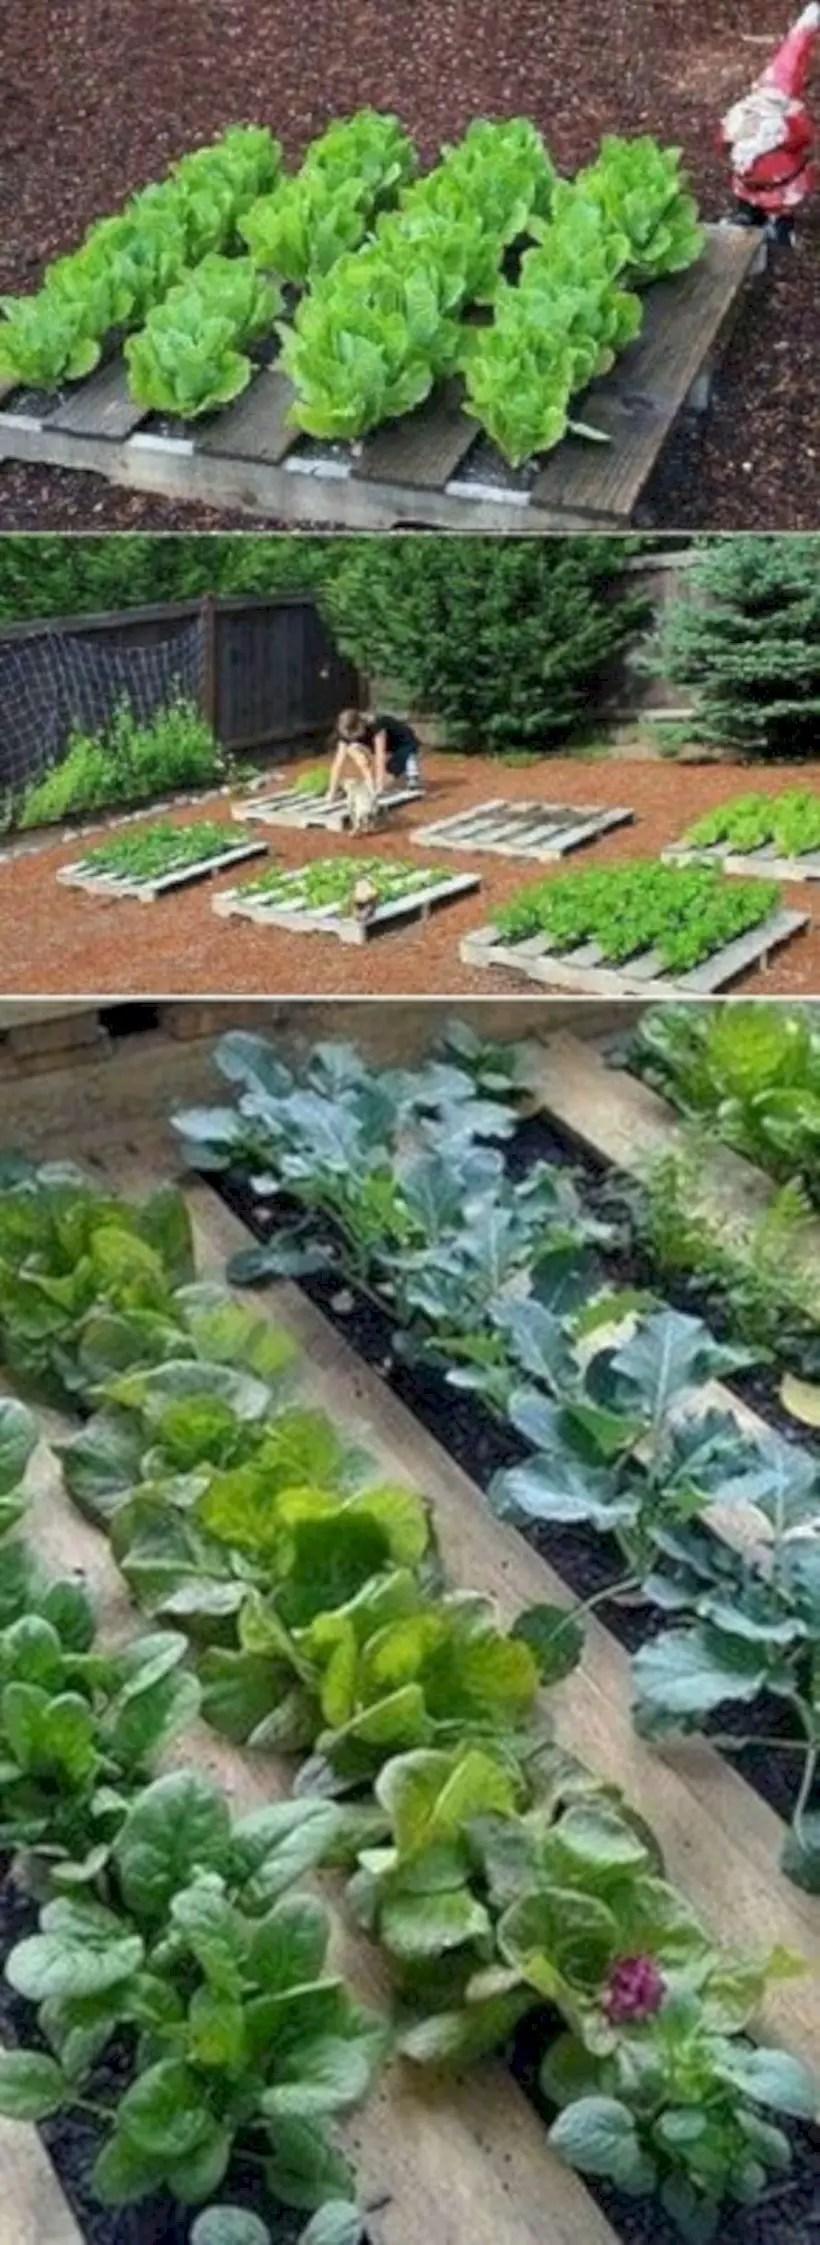 Wooden pallets and little vegetables garden